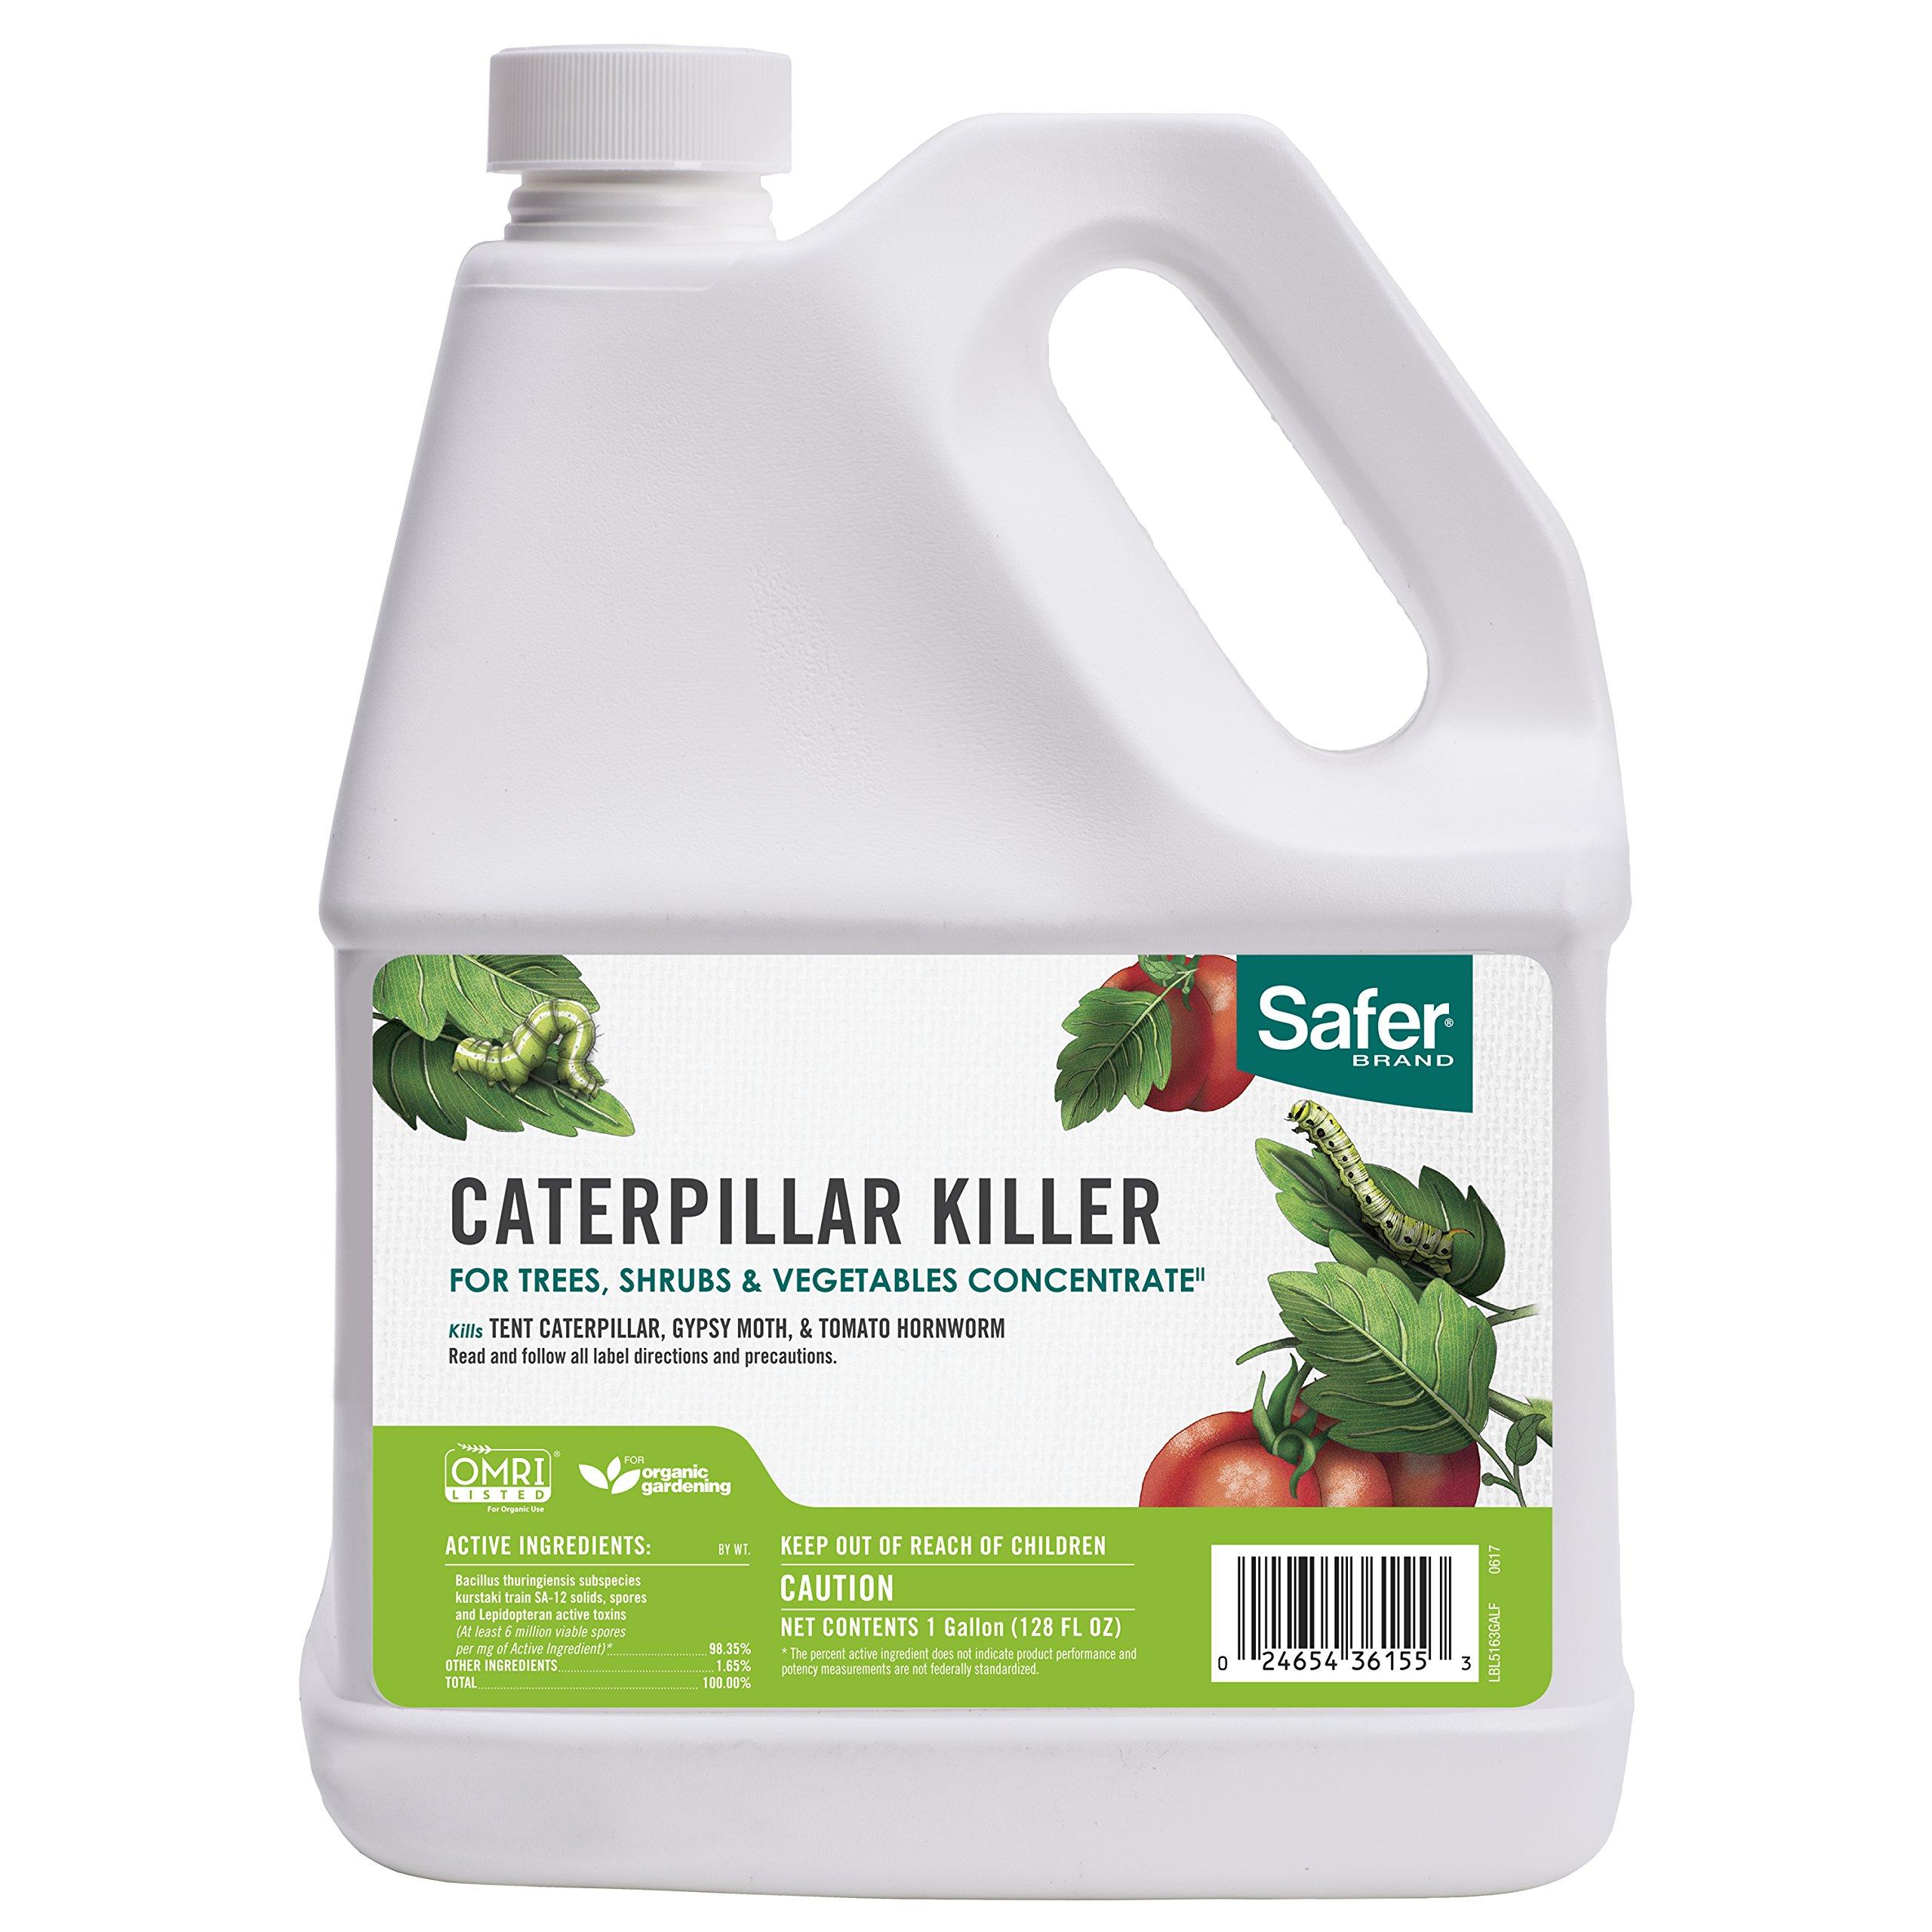 Safer Brand Caterpillar Killer Concentrate 1gal - 4 pack 5160GAL